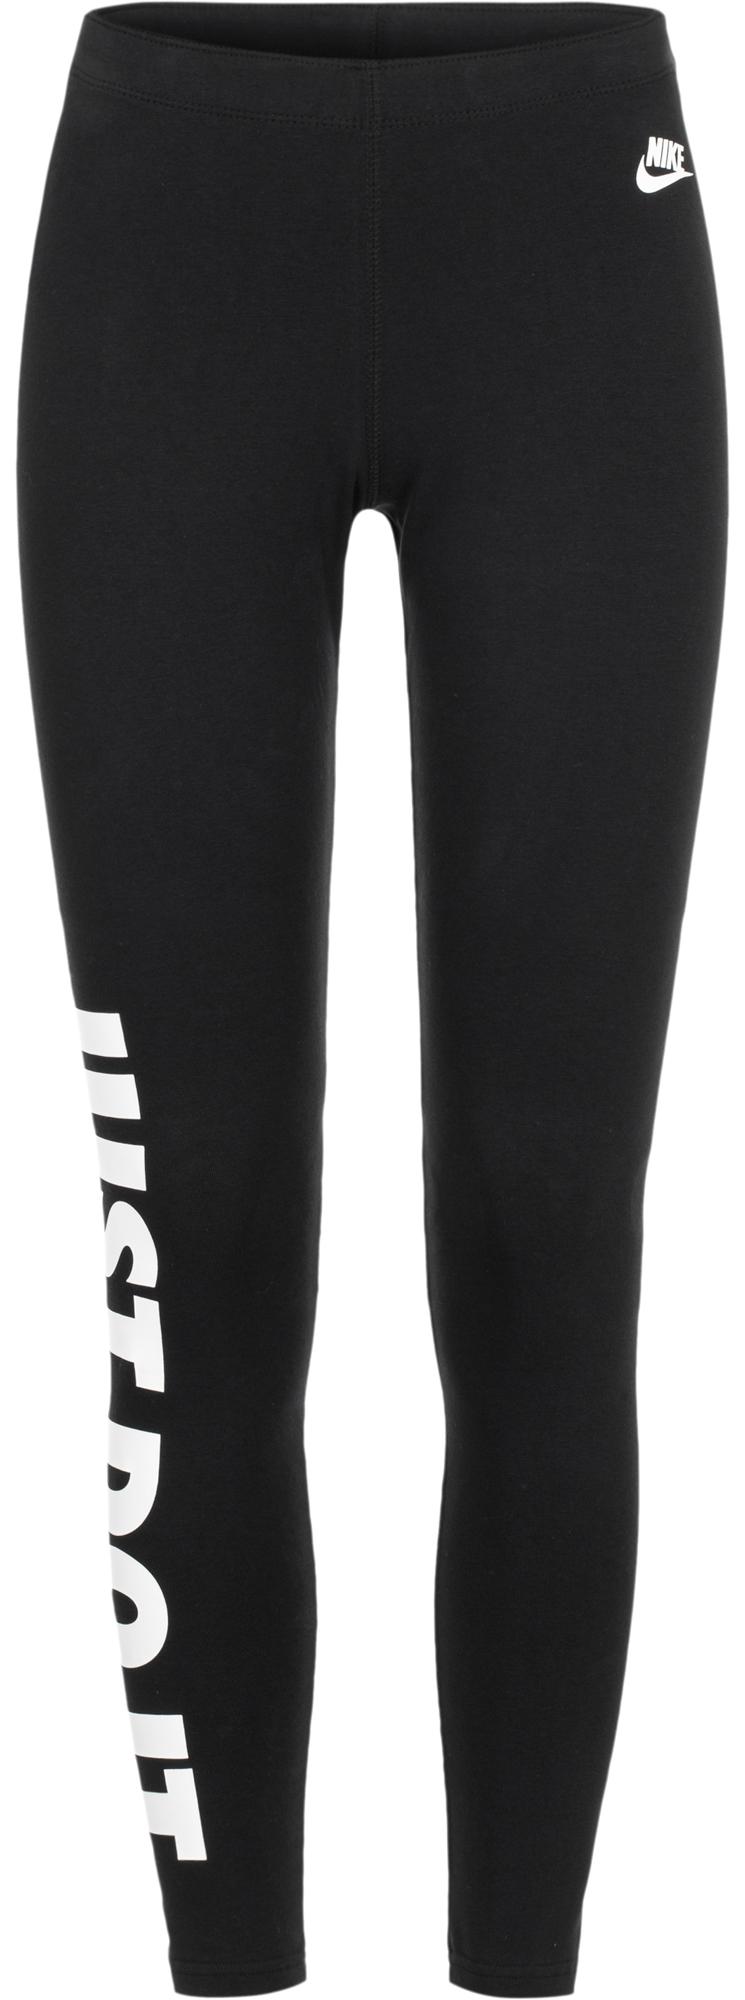 Nike Легинсы женские Nike Sportswear, размер 48-50 nike легинсы женские nike sculpt hyper